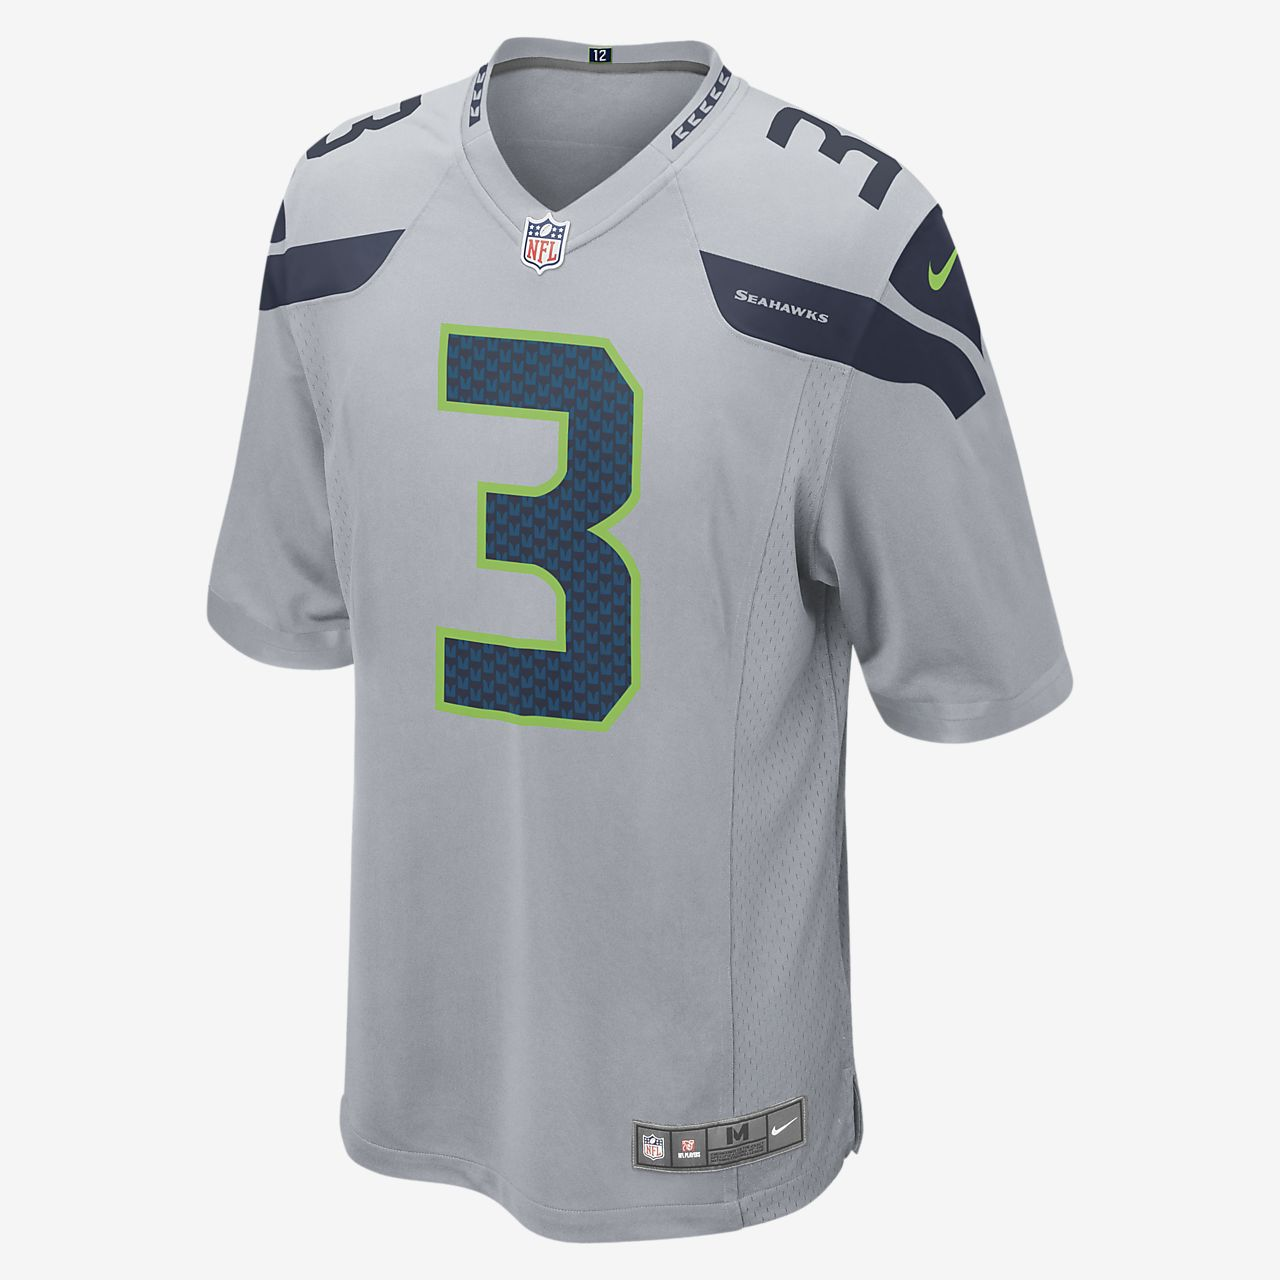 Camiseta oficial de fútbol americano para hombre NFL Seattle Seahawks (Russel Wilson)